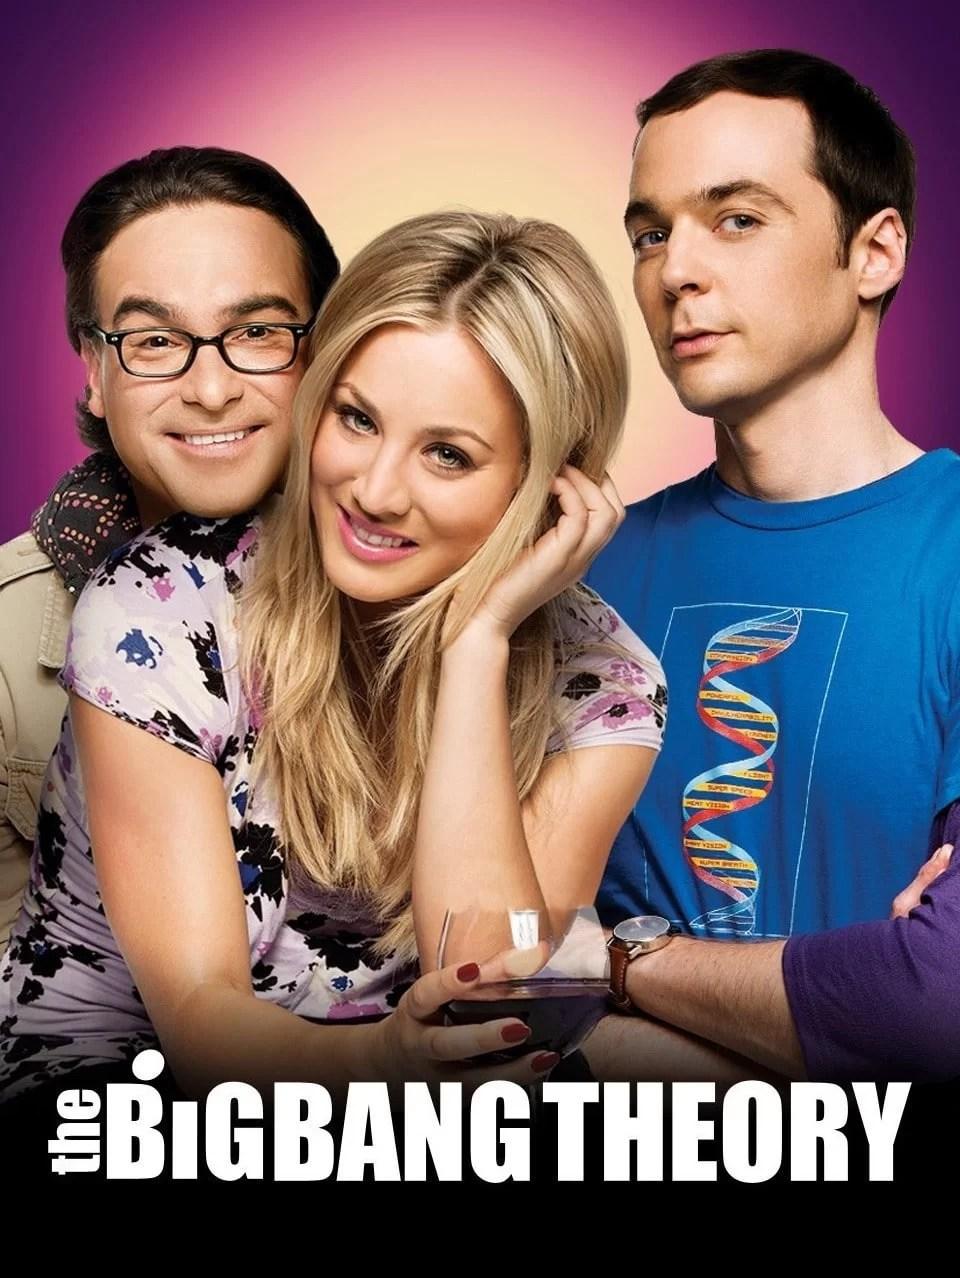 Can I watch The Big Bang Theory on Hulu 2